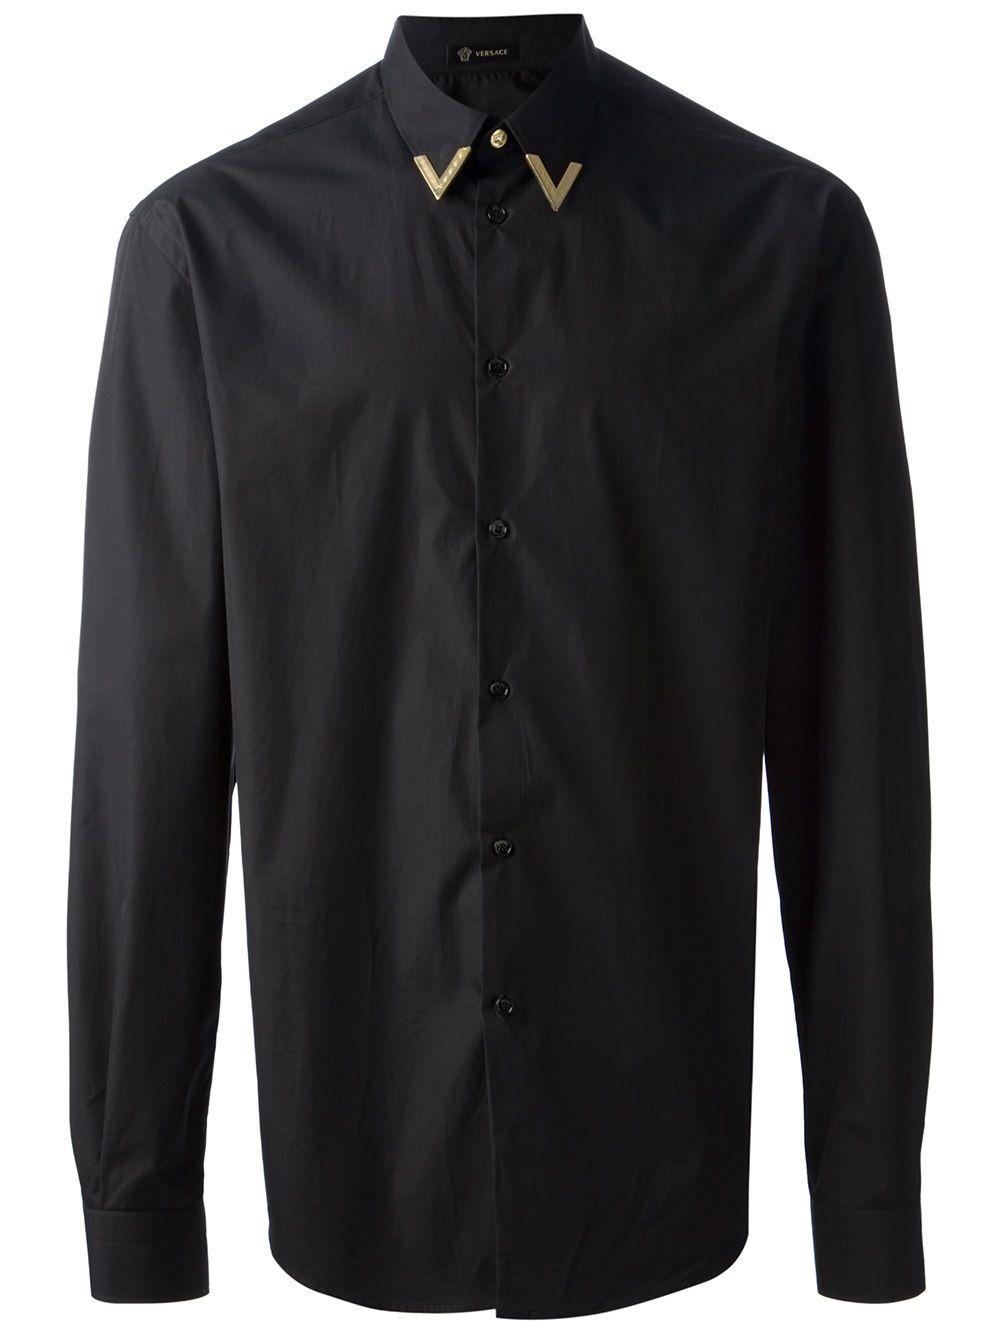 versace black shirt with gold metal collar tip shrts pinterest versace. Black Bedroom Furniture Sets. Home Design Ideas